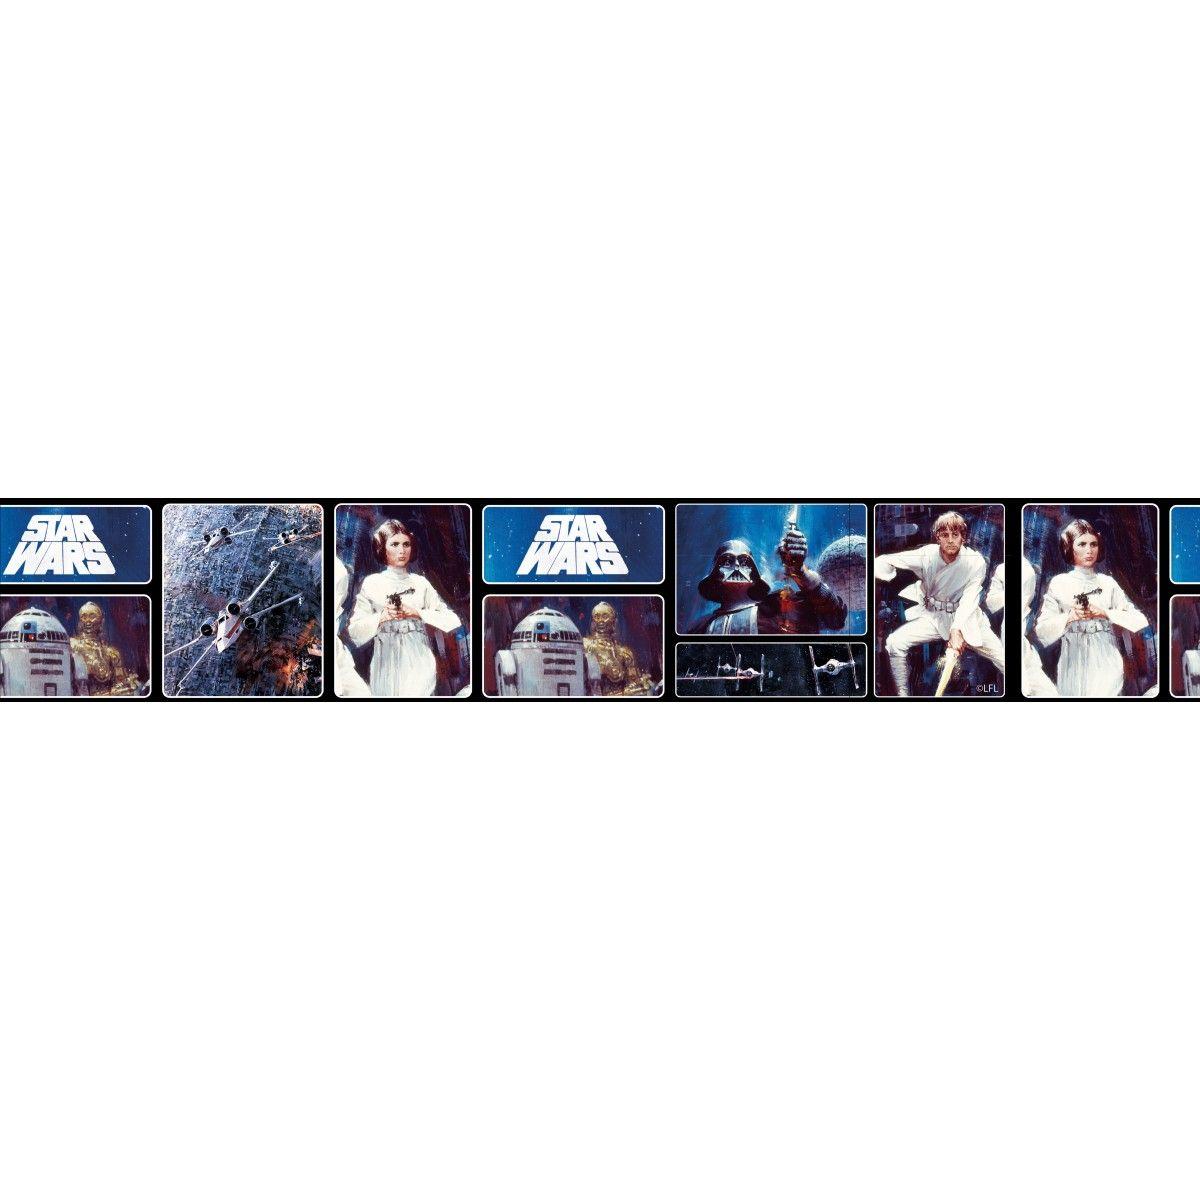 Star Wars Retro Self Adhesive Wallpaper Border 5m Self Adhesive Wallpaper Borders Star Wars Wallpaper Wallpaper Border